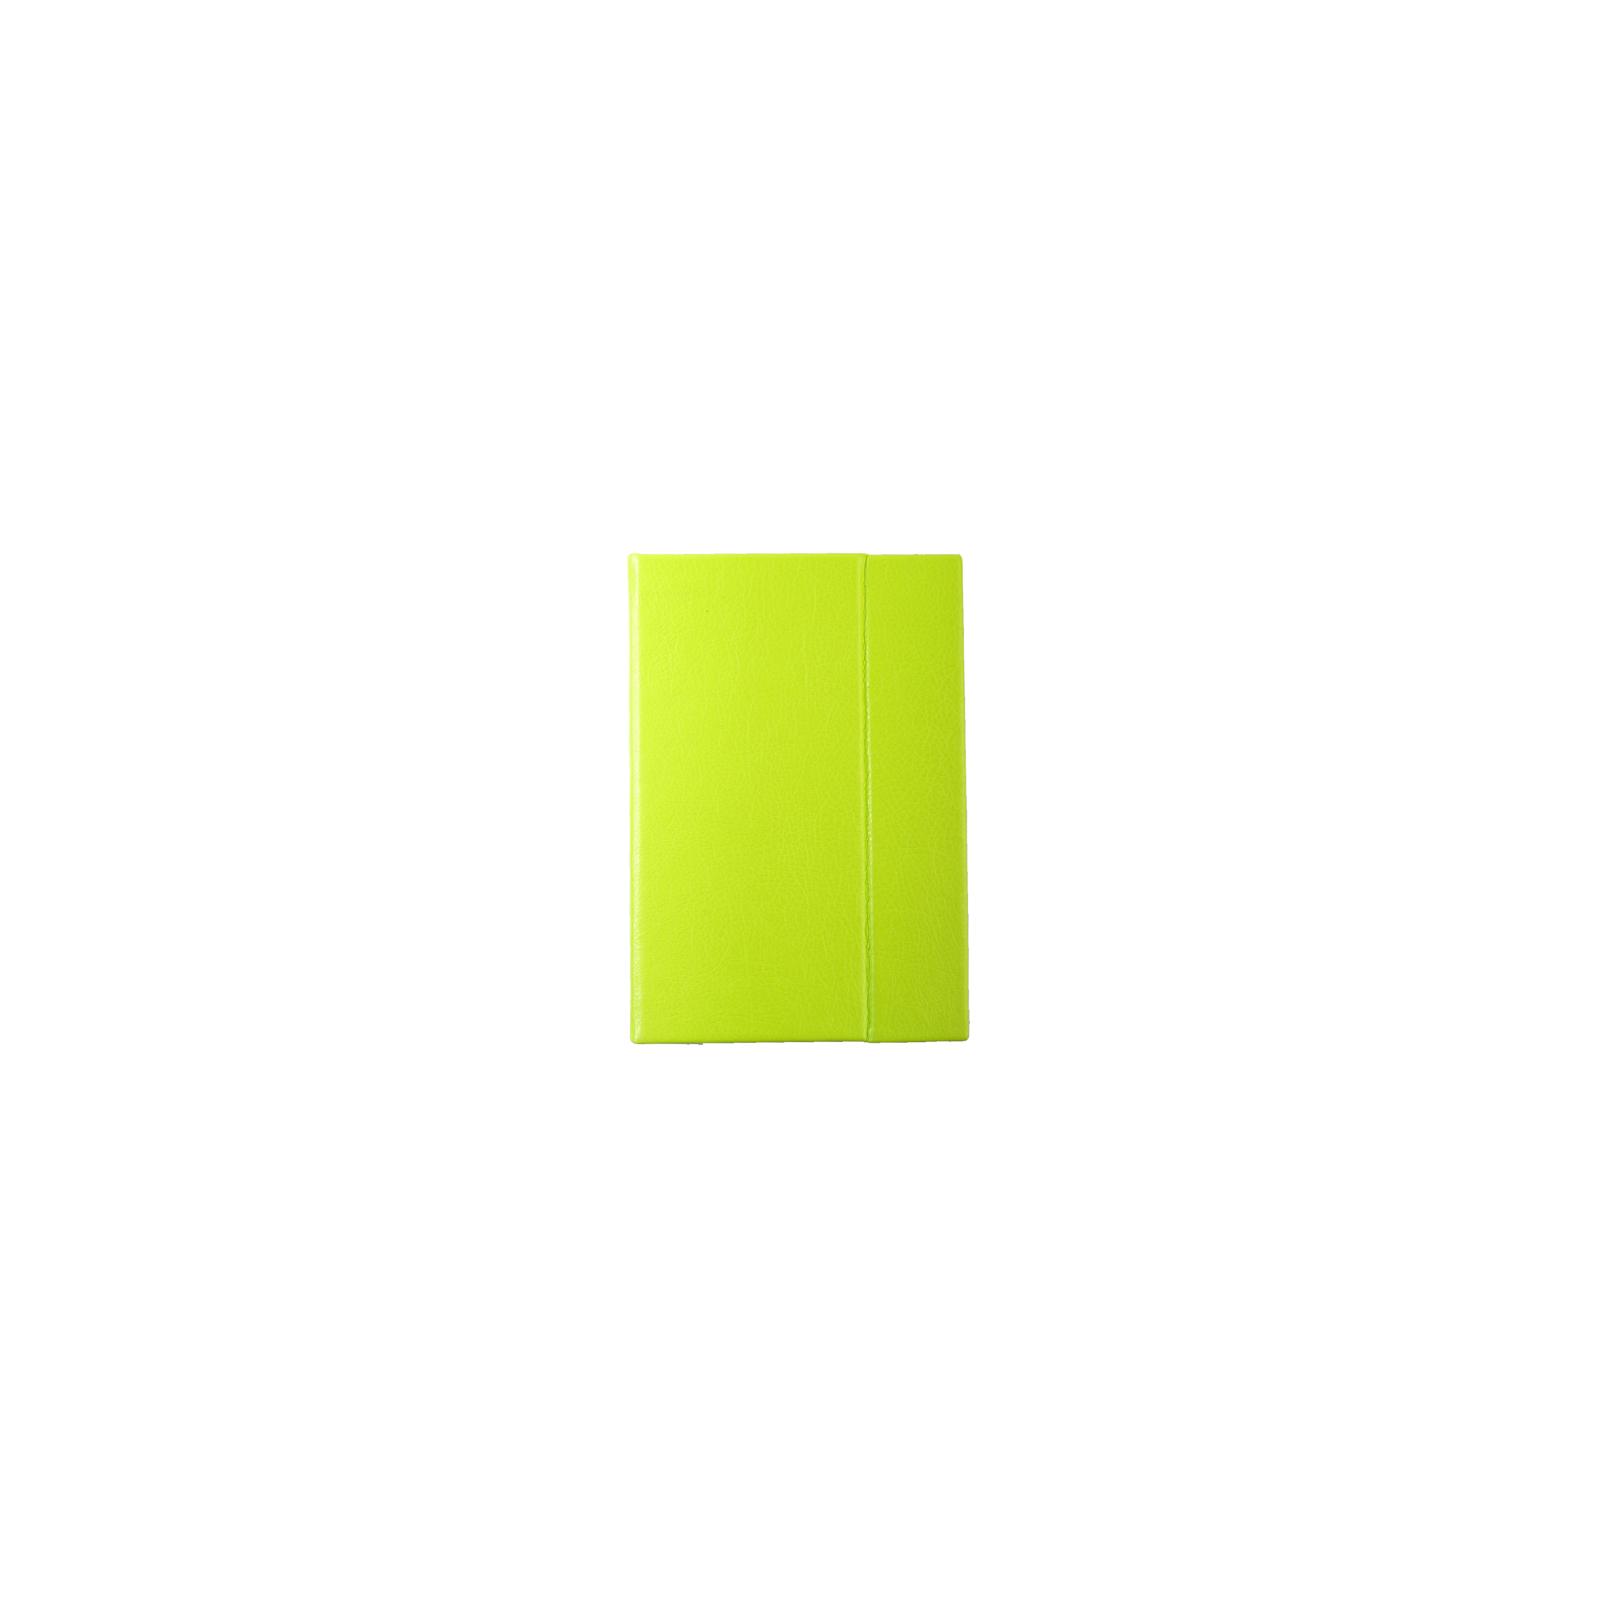 Чехол для планшета Vento 10.1 Desire Bright - lime изображение 2